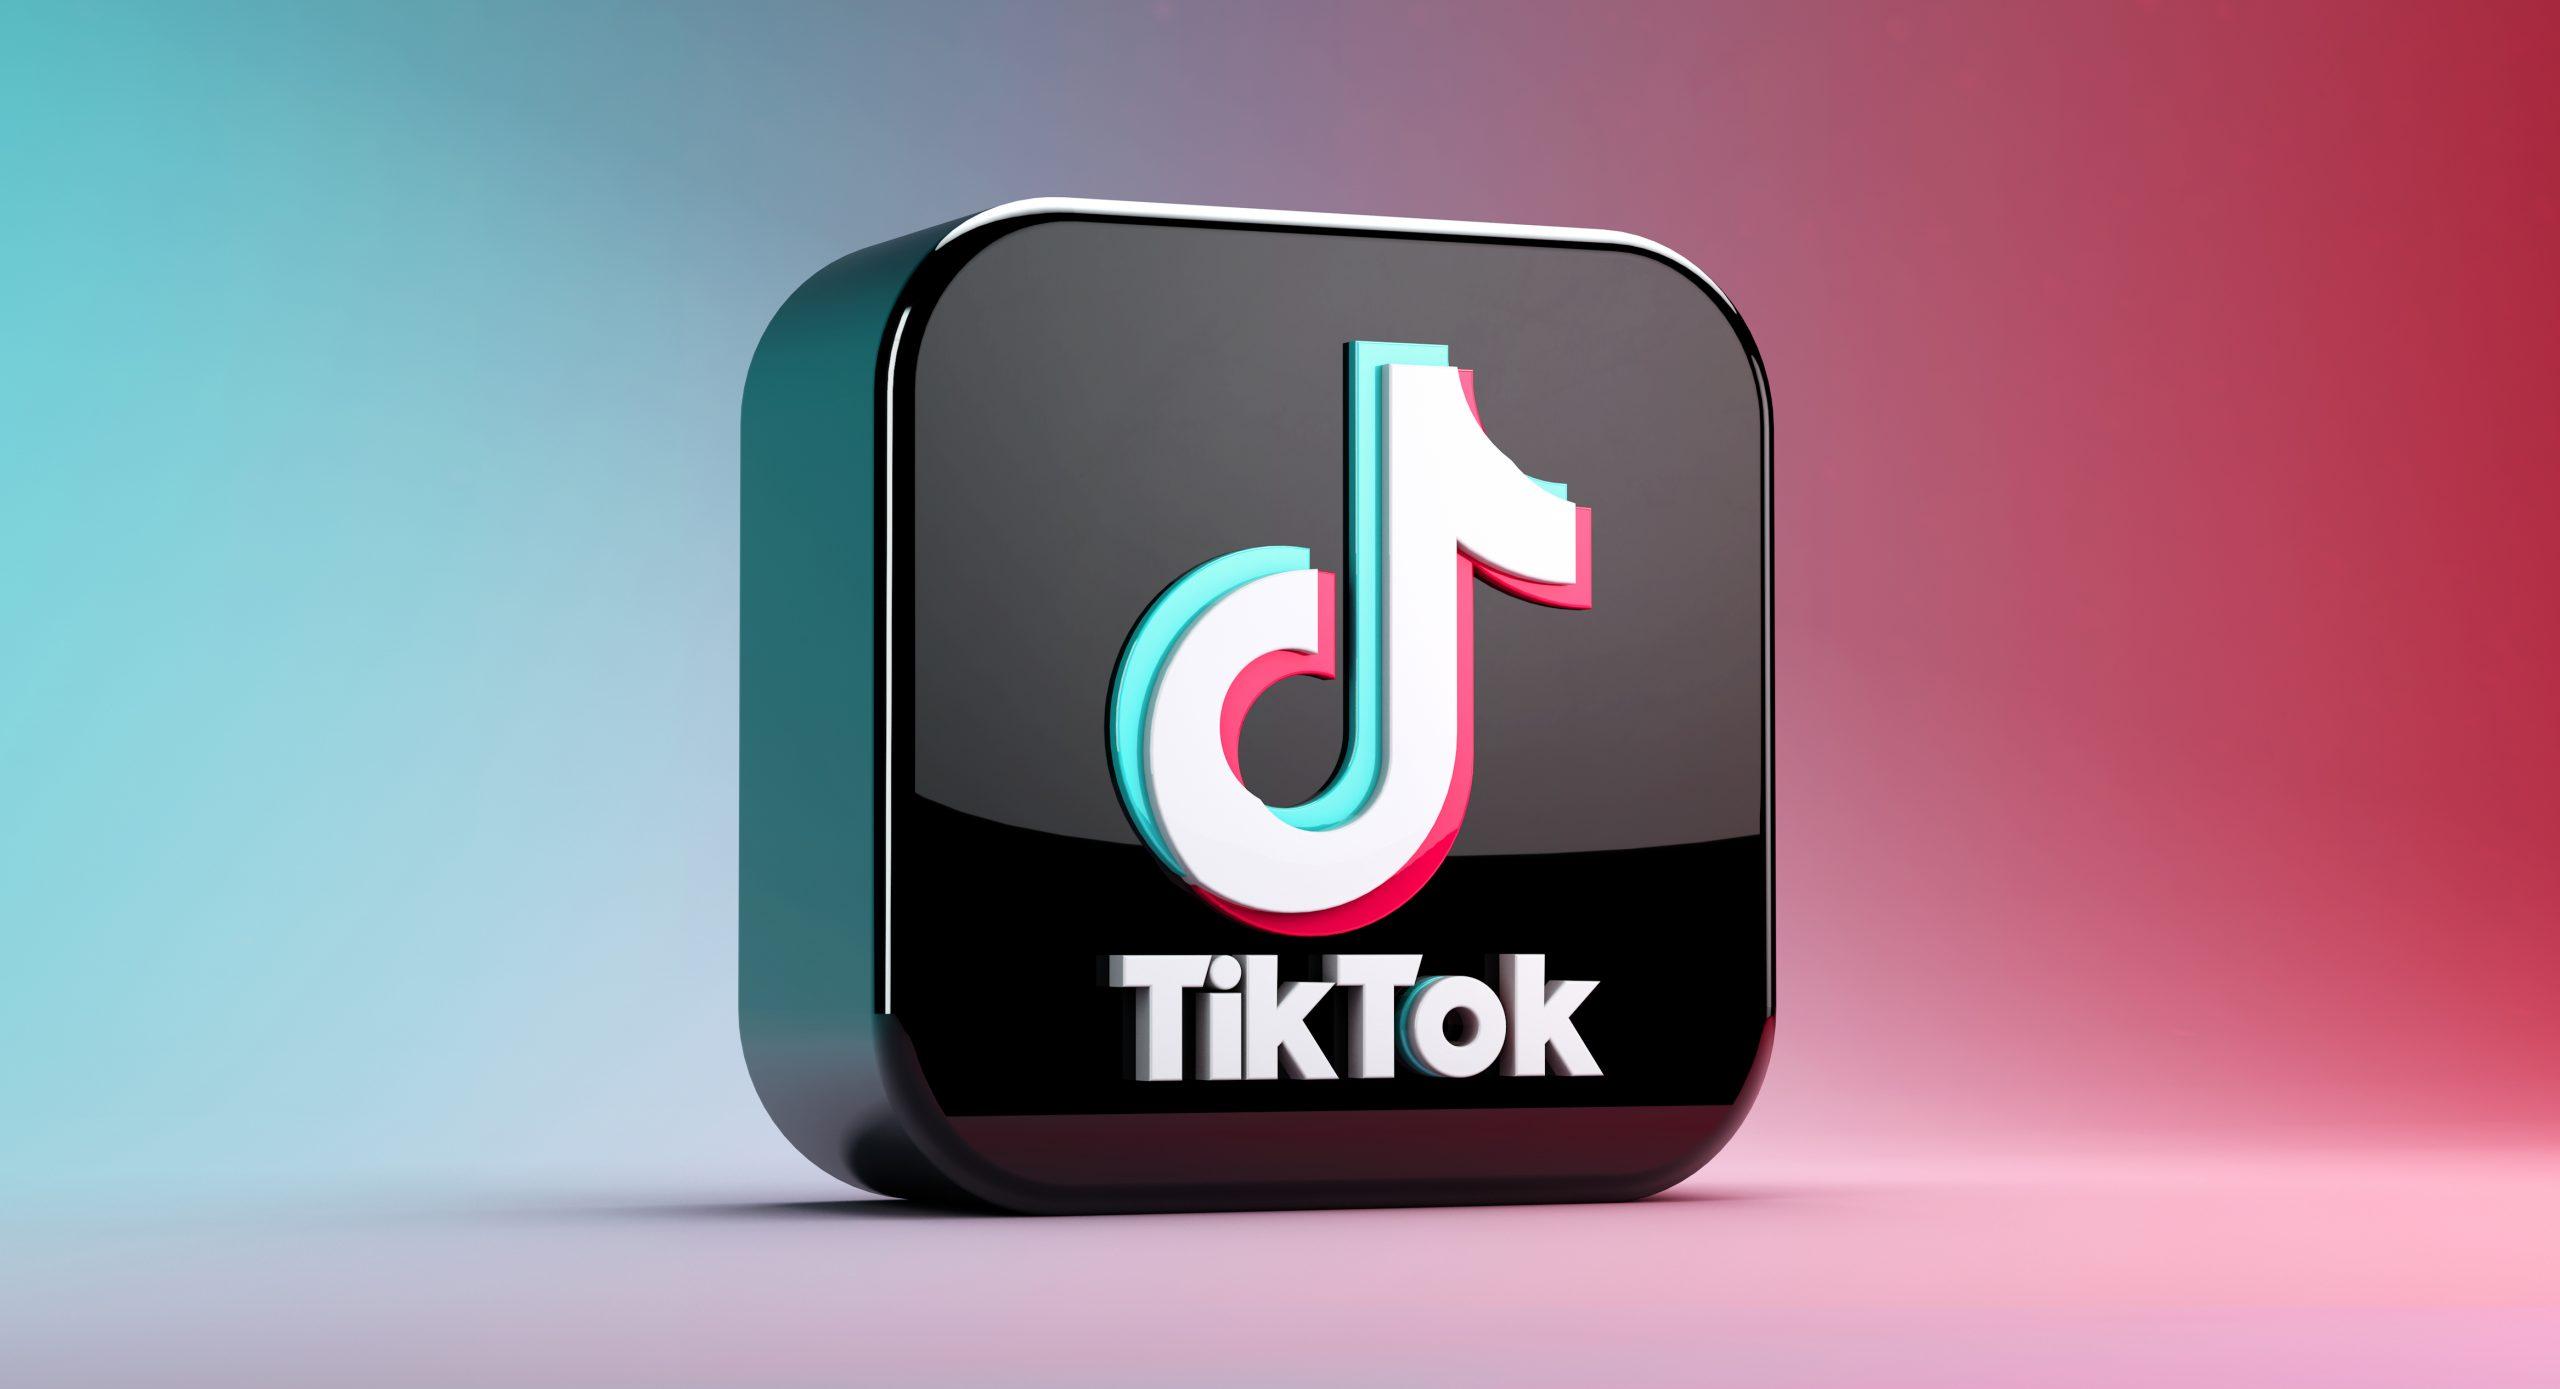 Importance of TikTok as a platform